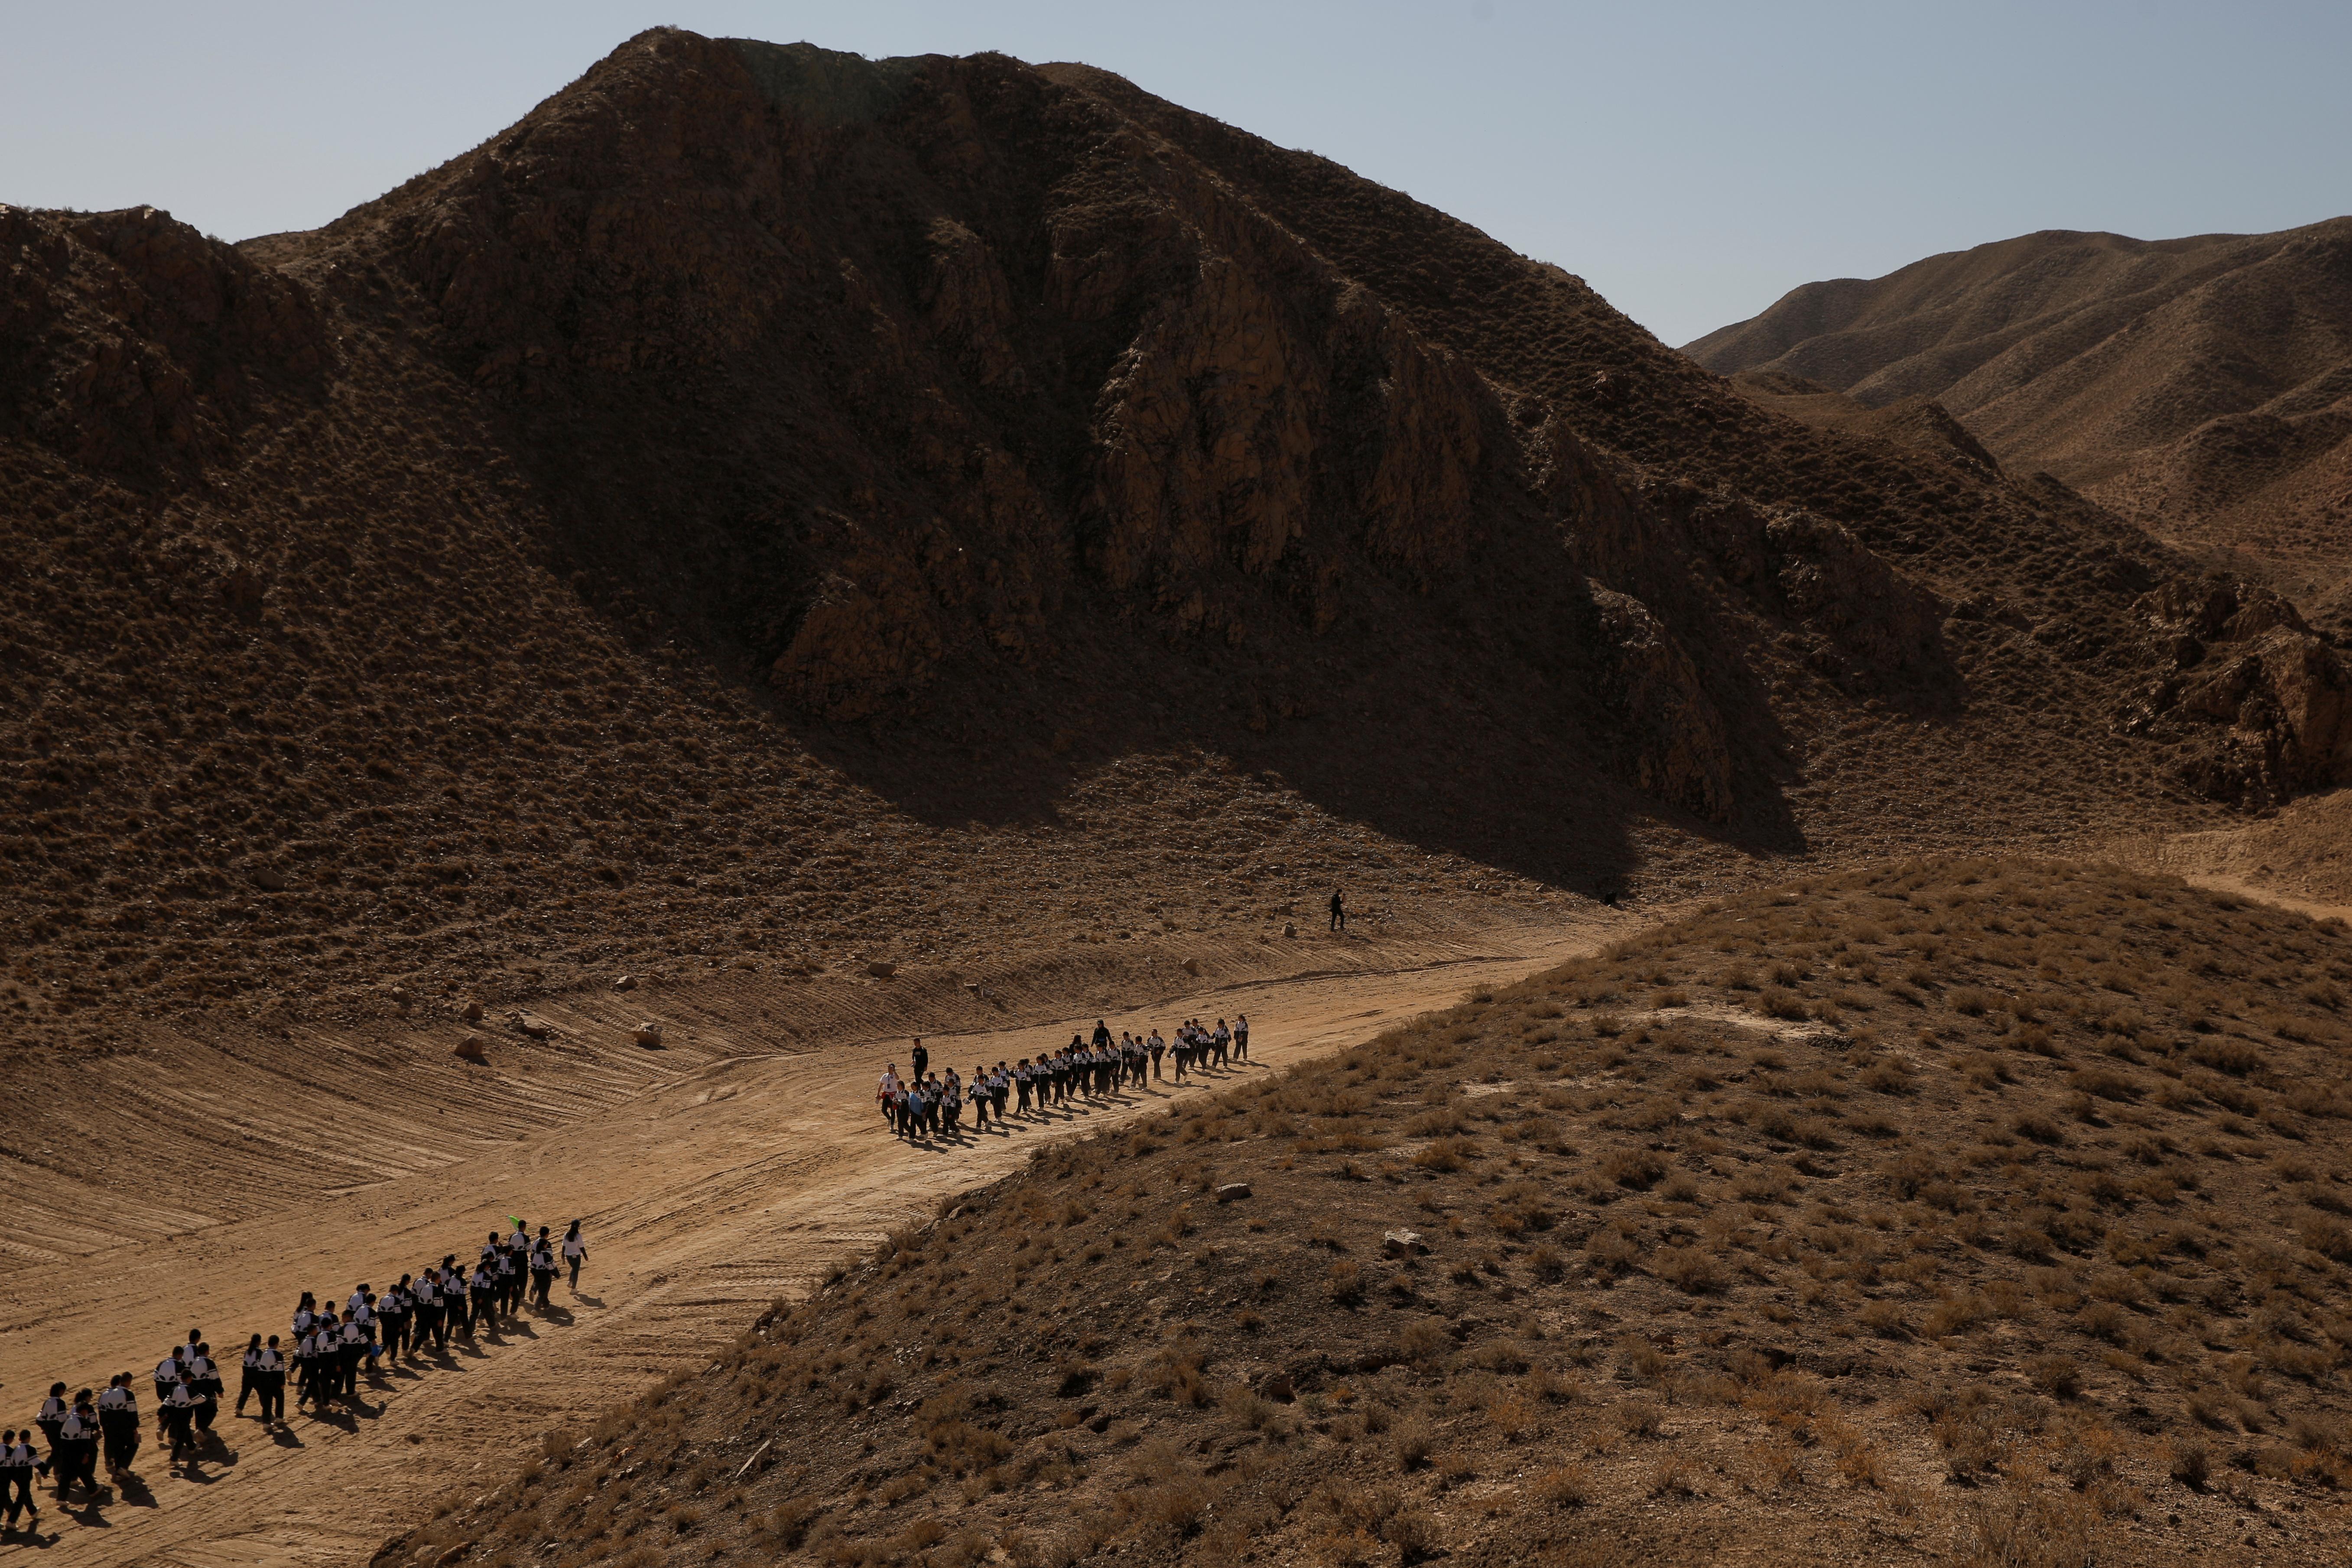 Students walk through Gobi Desert